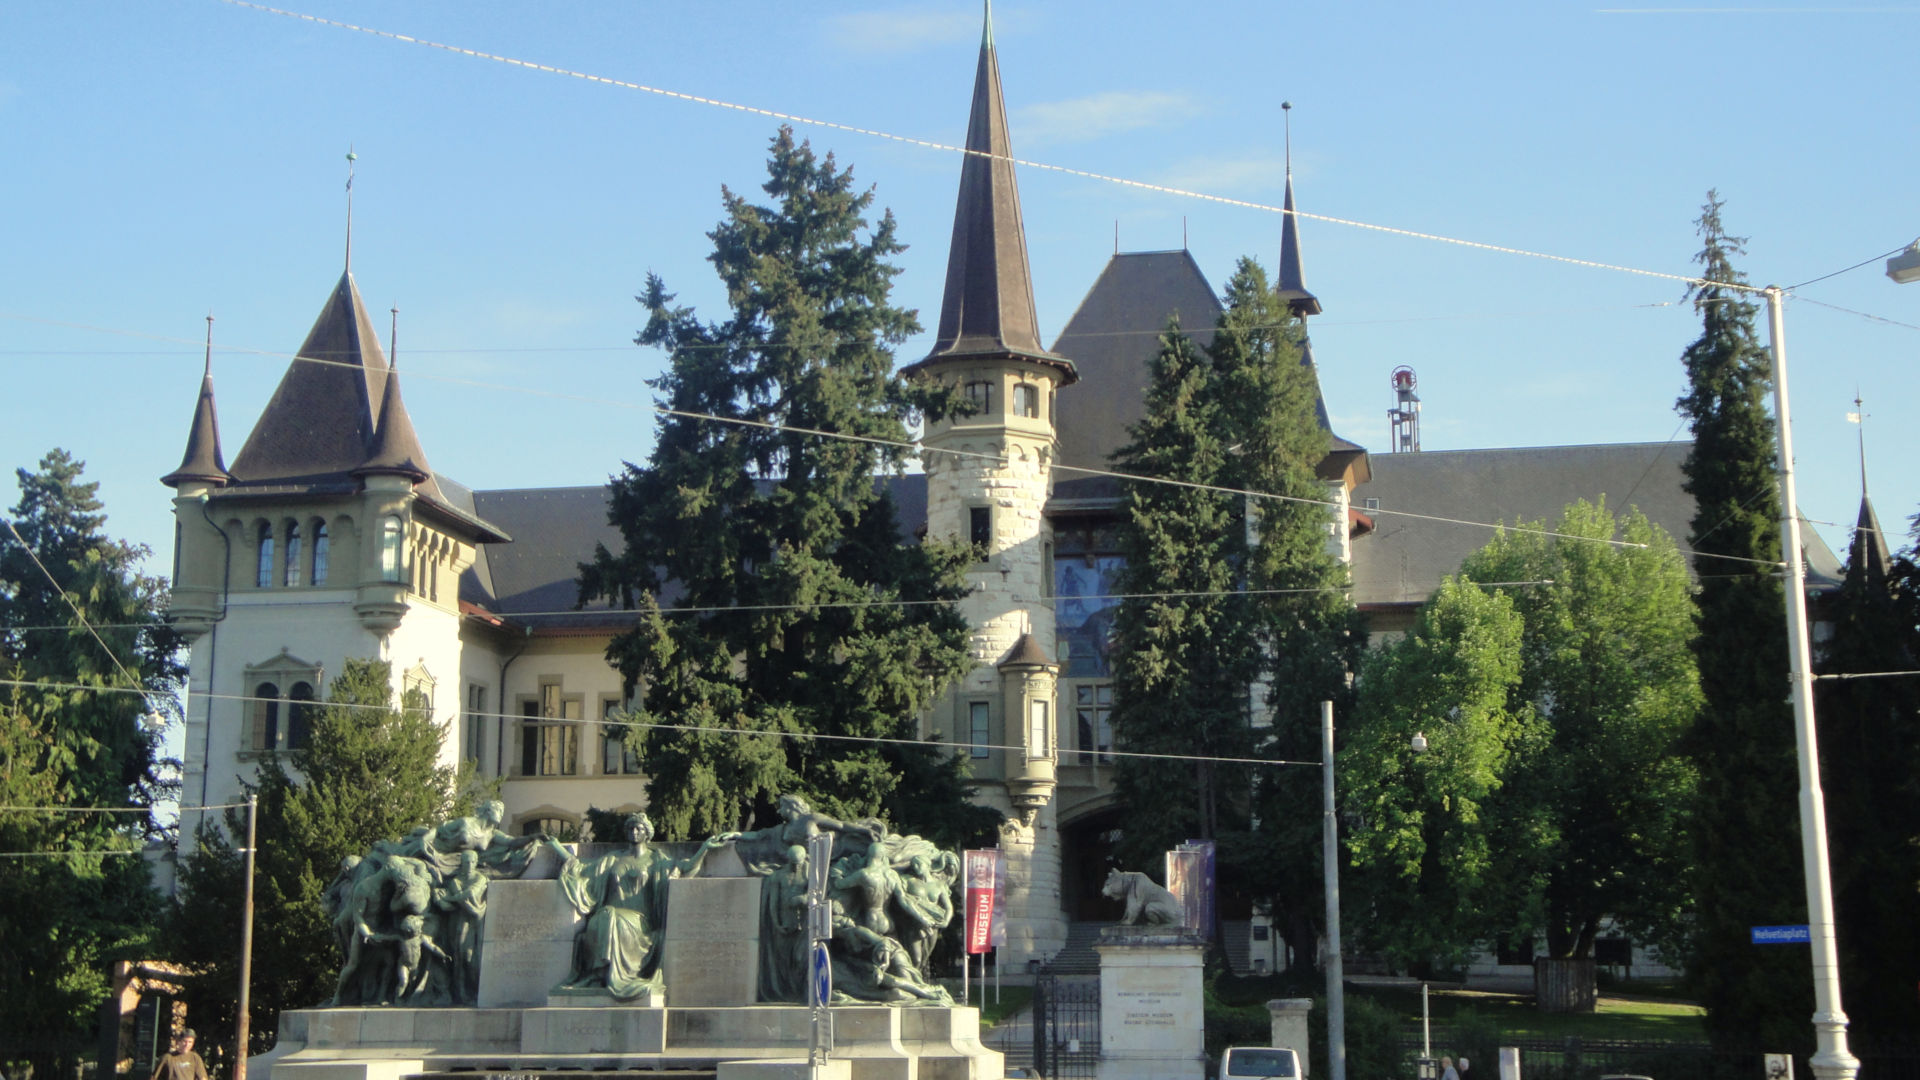 Bern, Bernisches Historisches Museum